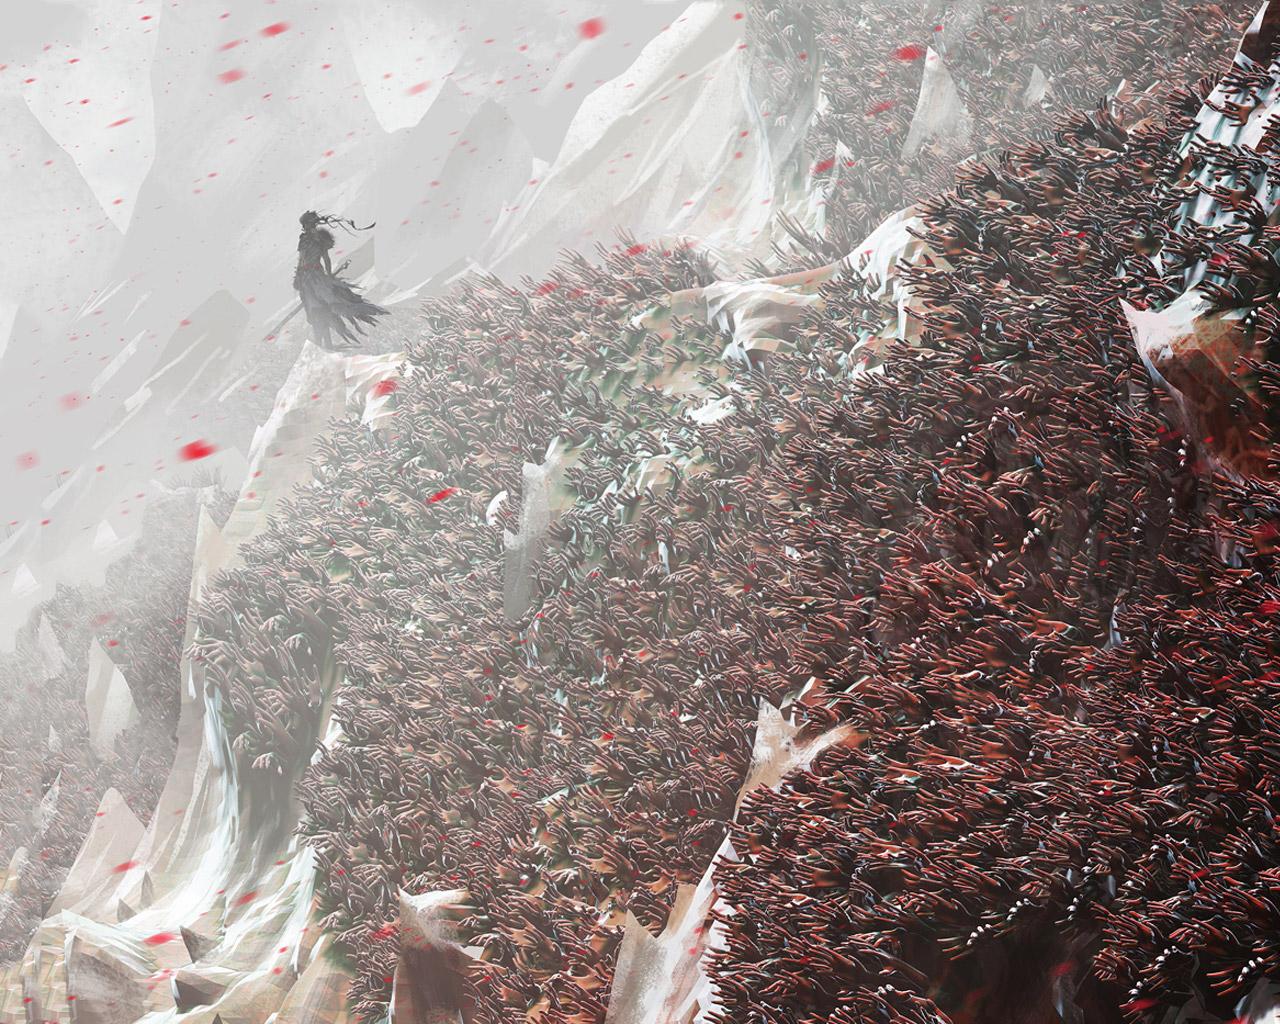 Hellblade: Senua's Sacrifice Wallpaper in 1280x1024